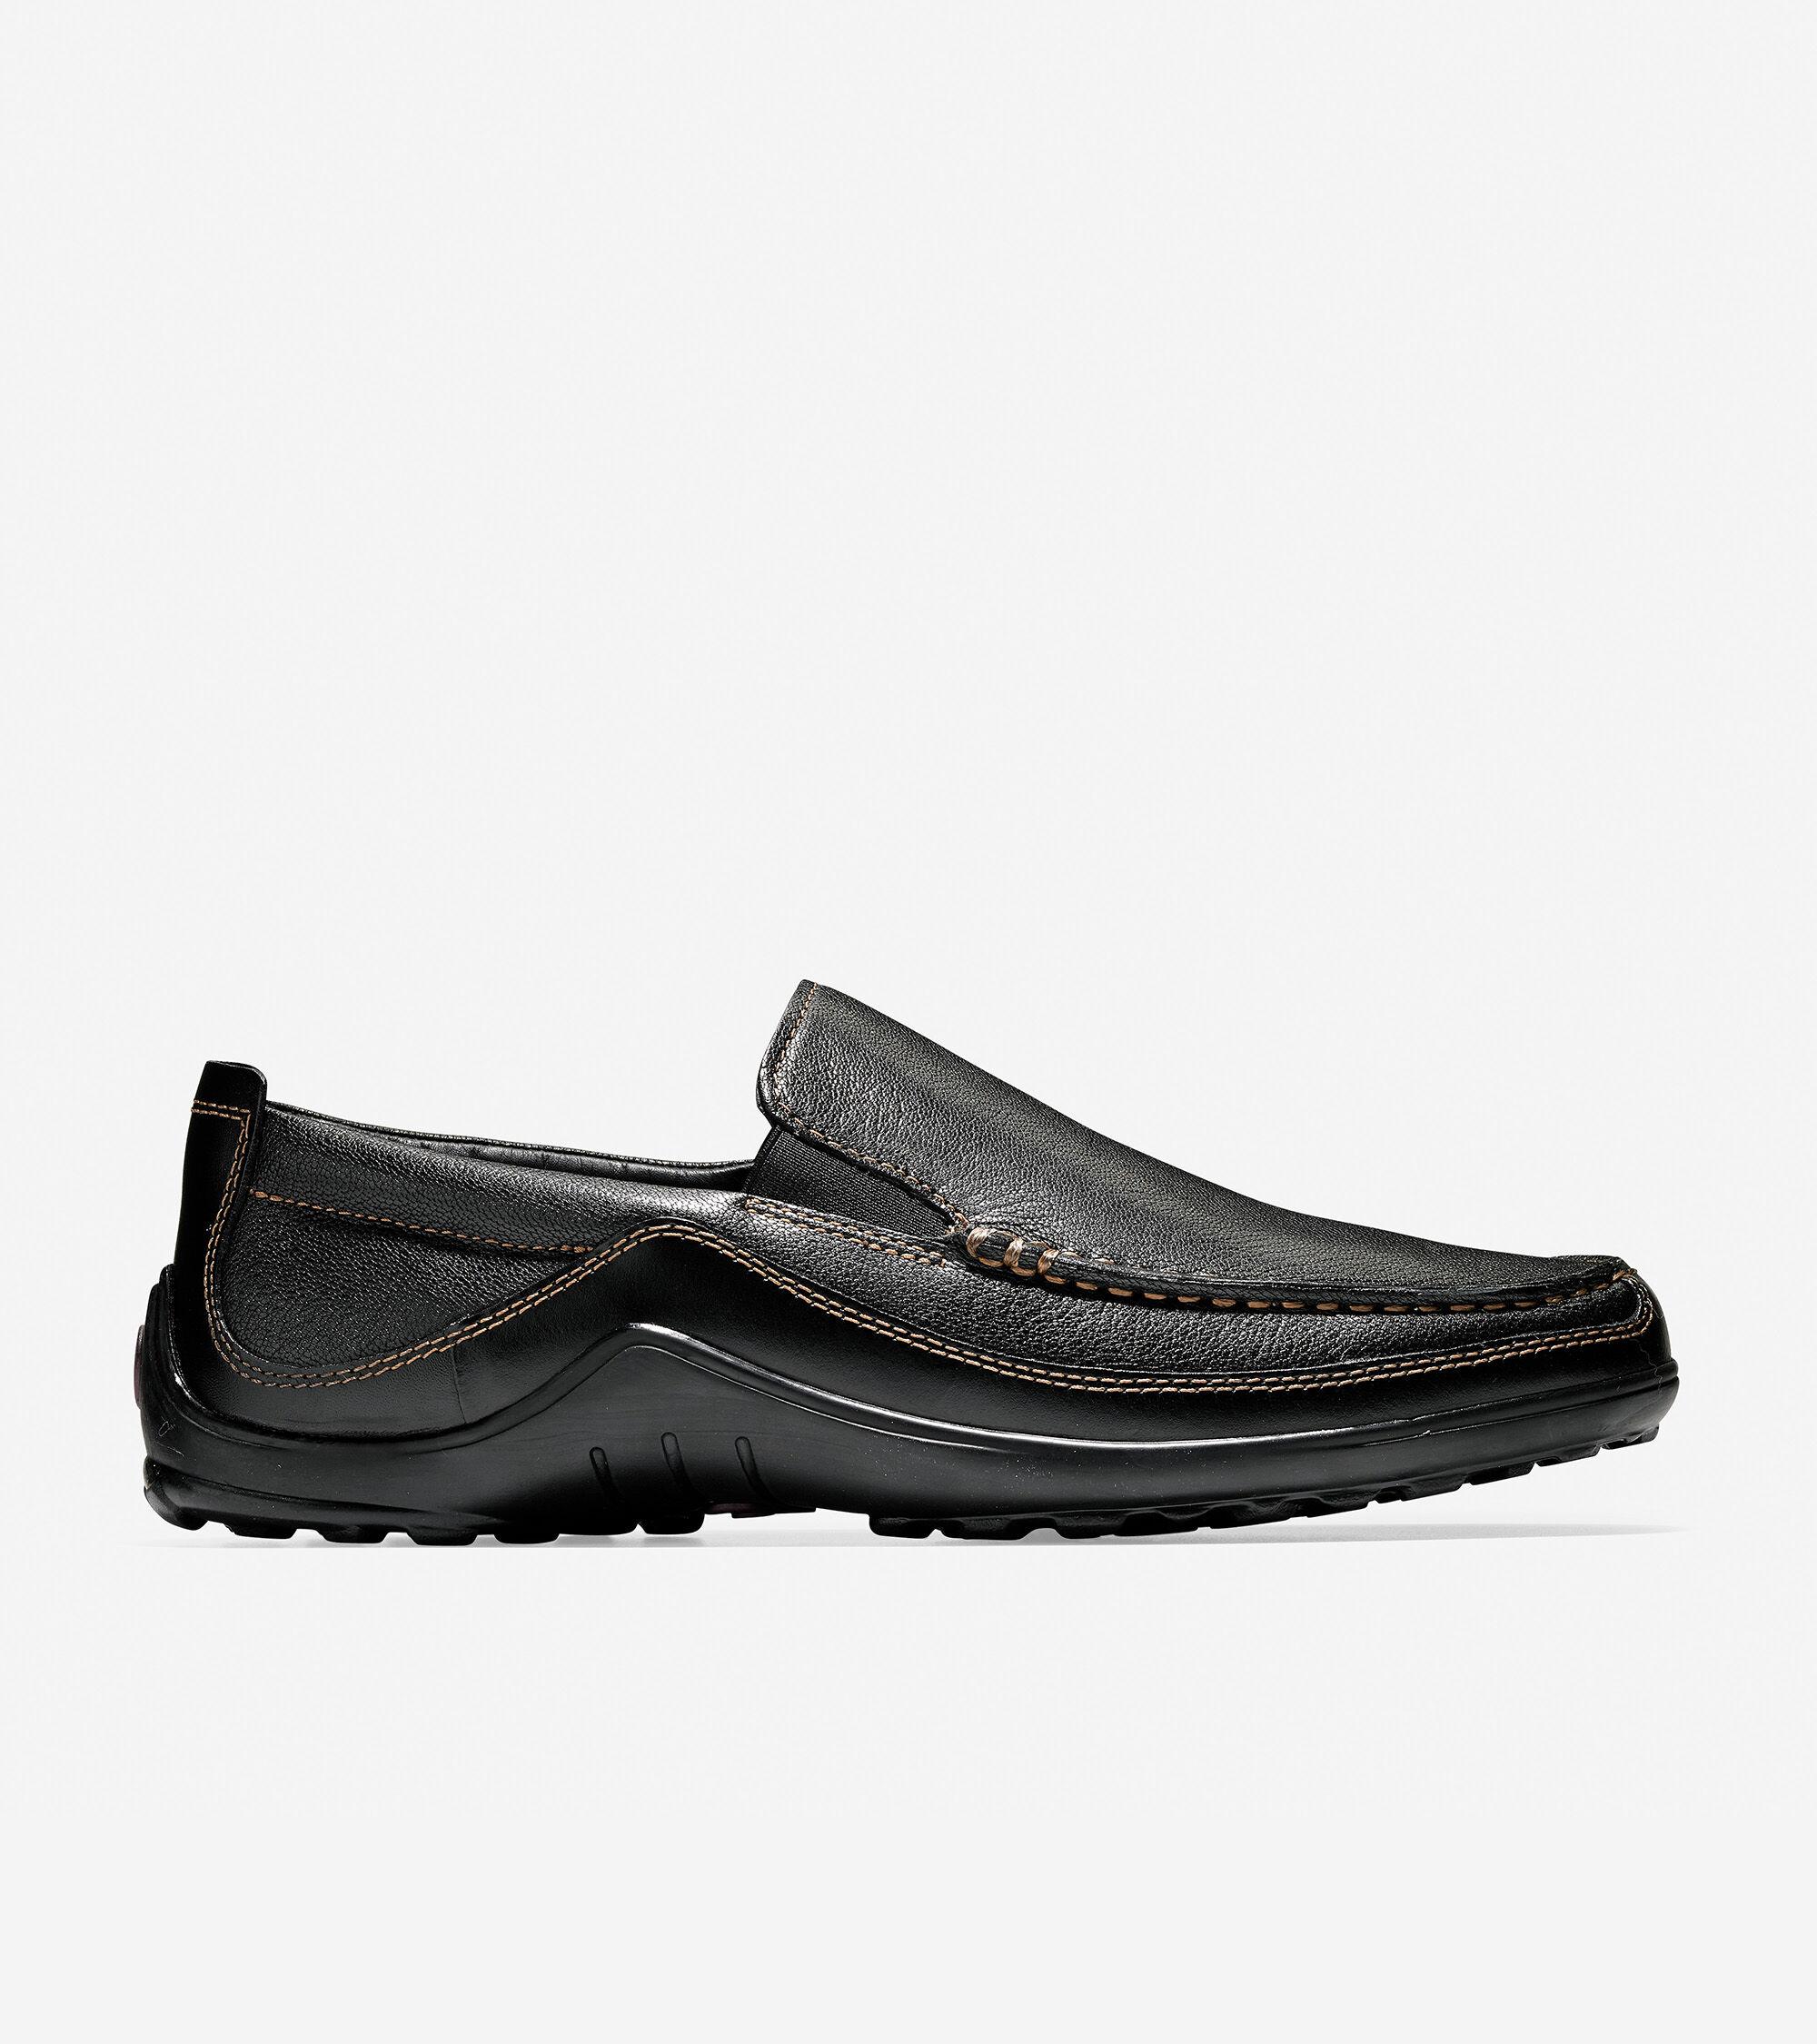 XLY Herren Smoking Oxford Leder Plain Toe Loafers, Metall